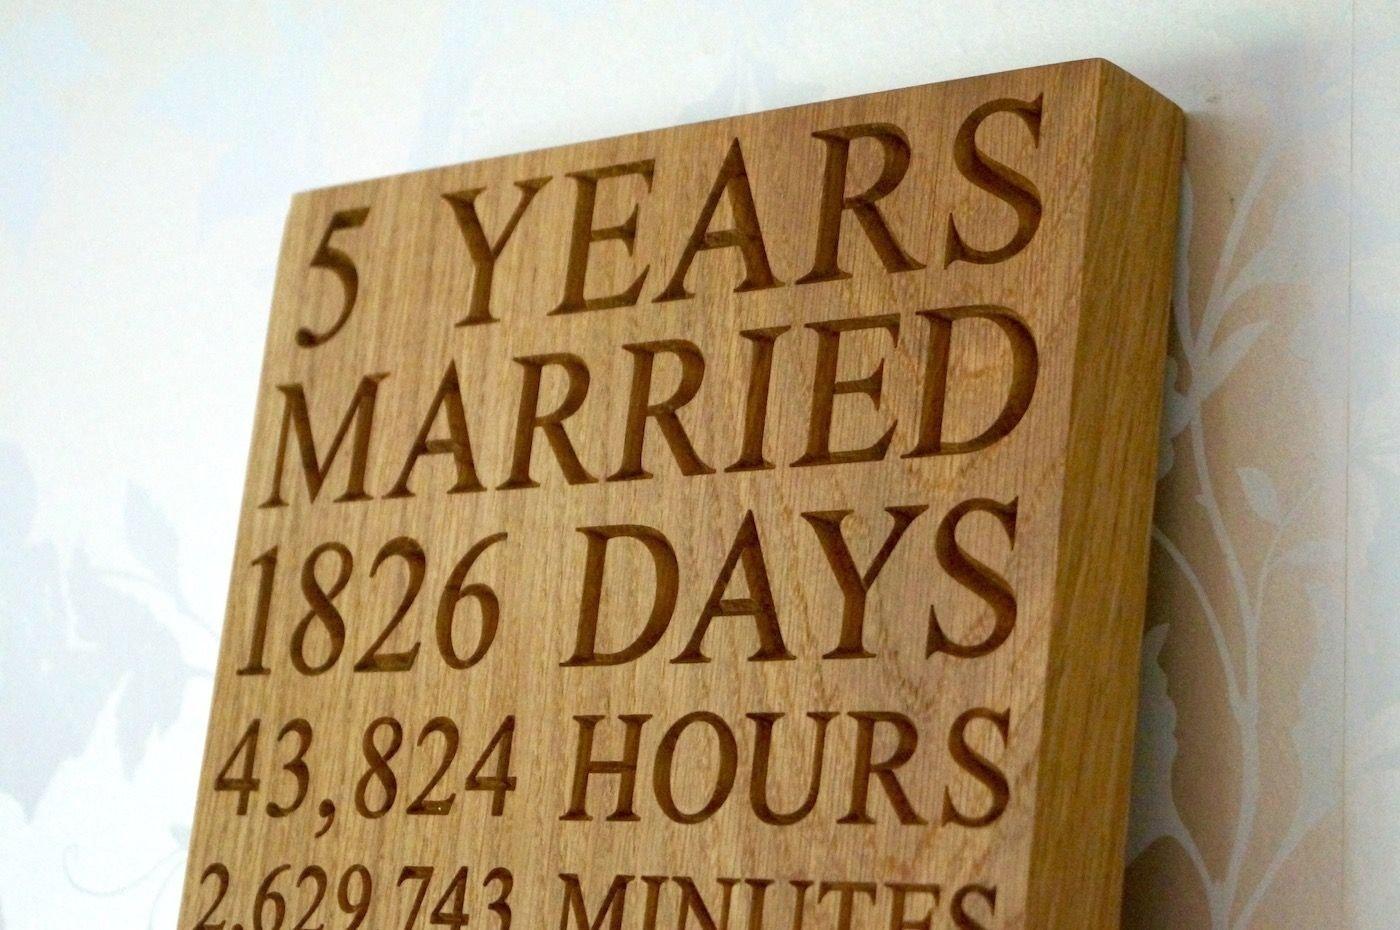 10 Spectacular 5Th Wedding Anniversary Gift Ideas For Her 5th wedding anniversary wishes quotes and messages happy 2020